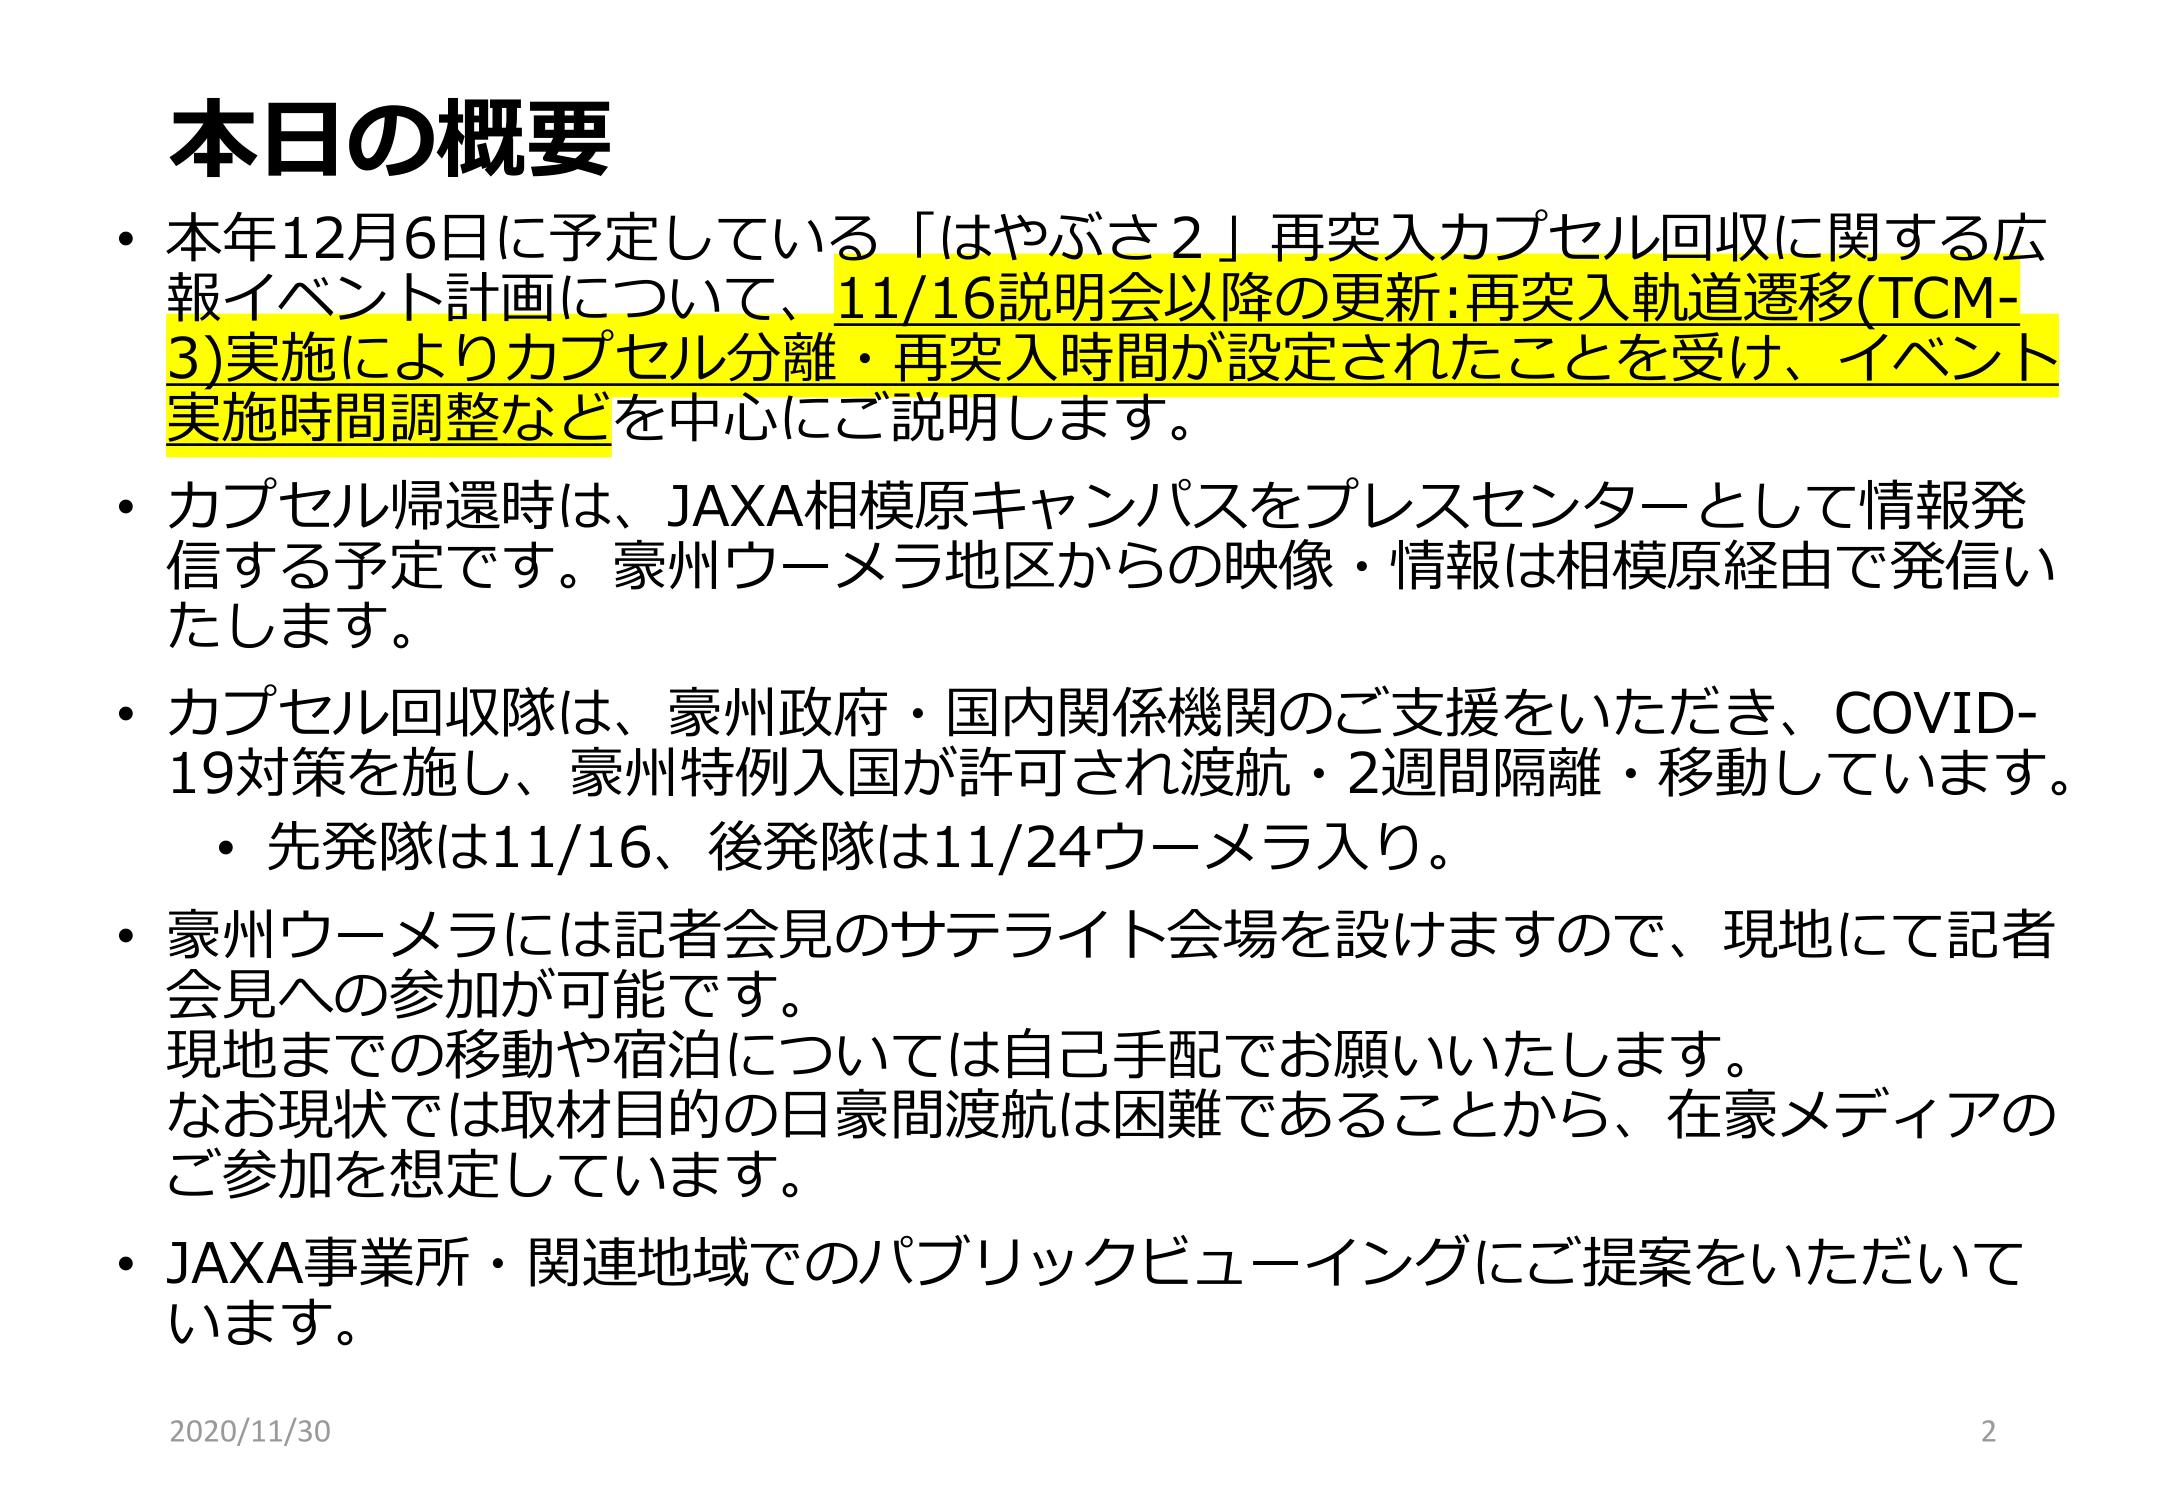 f:id:Imamura:20201130154309p:plain:h250